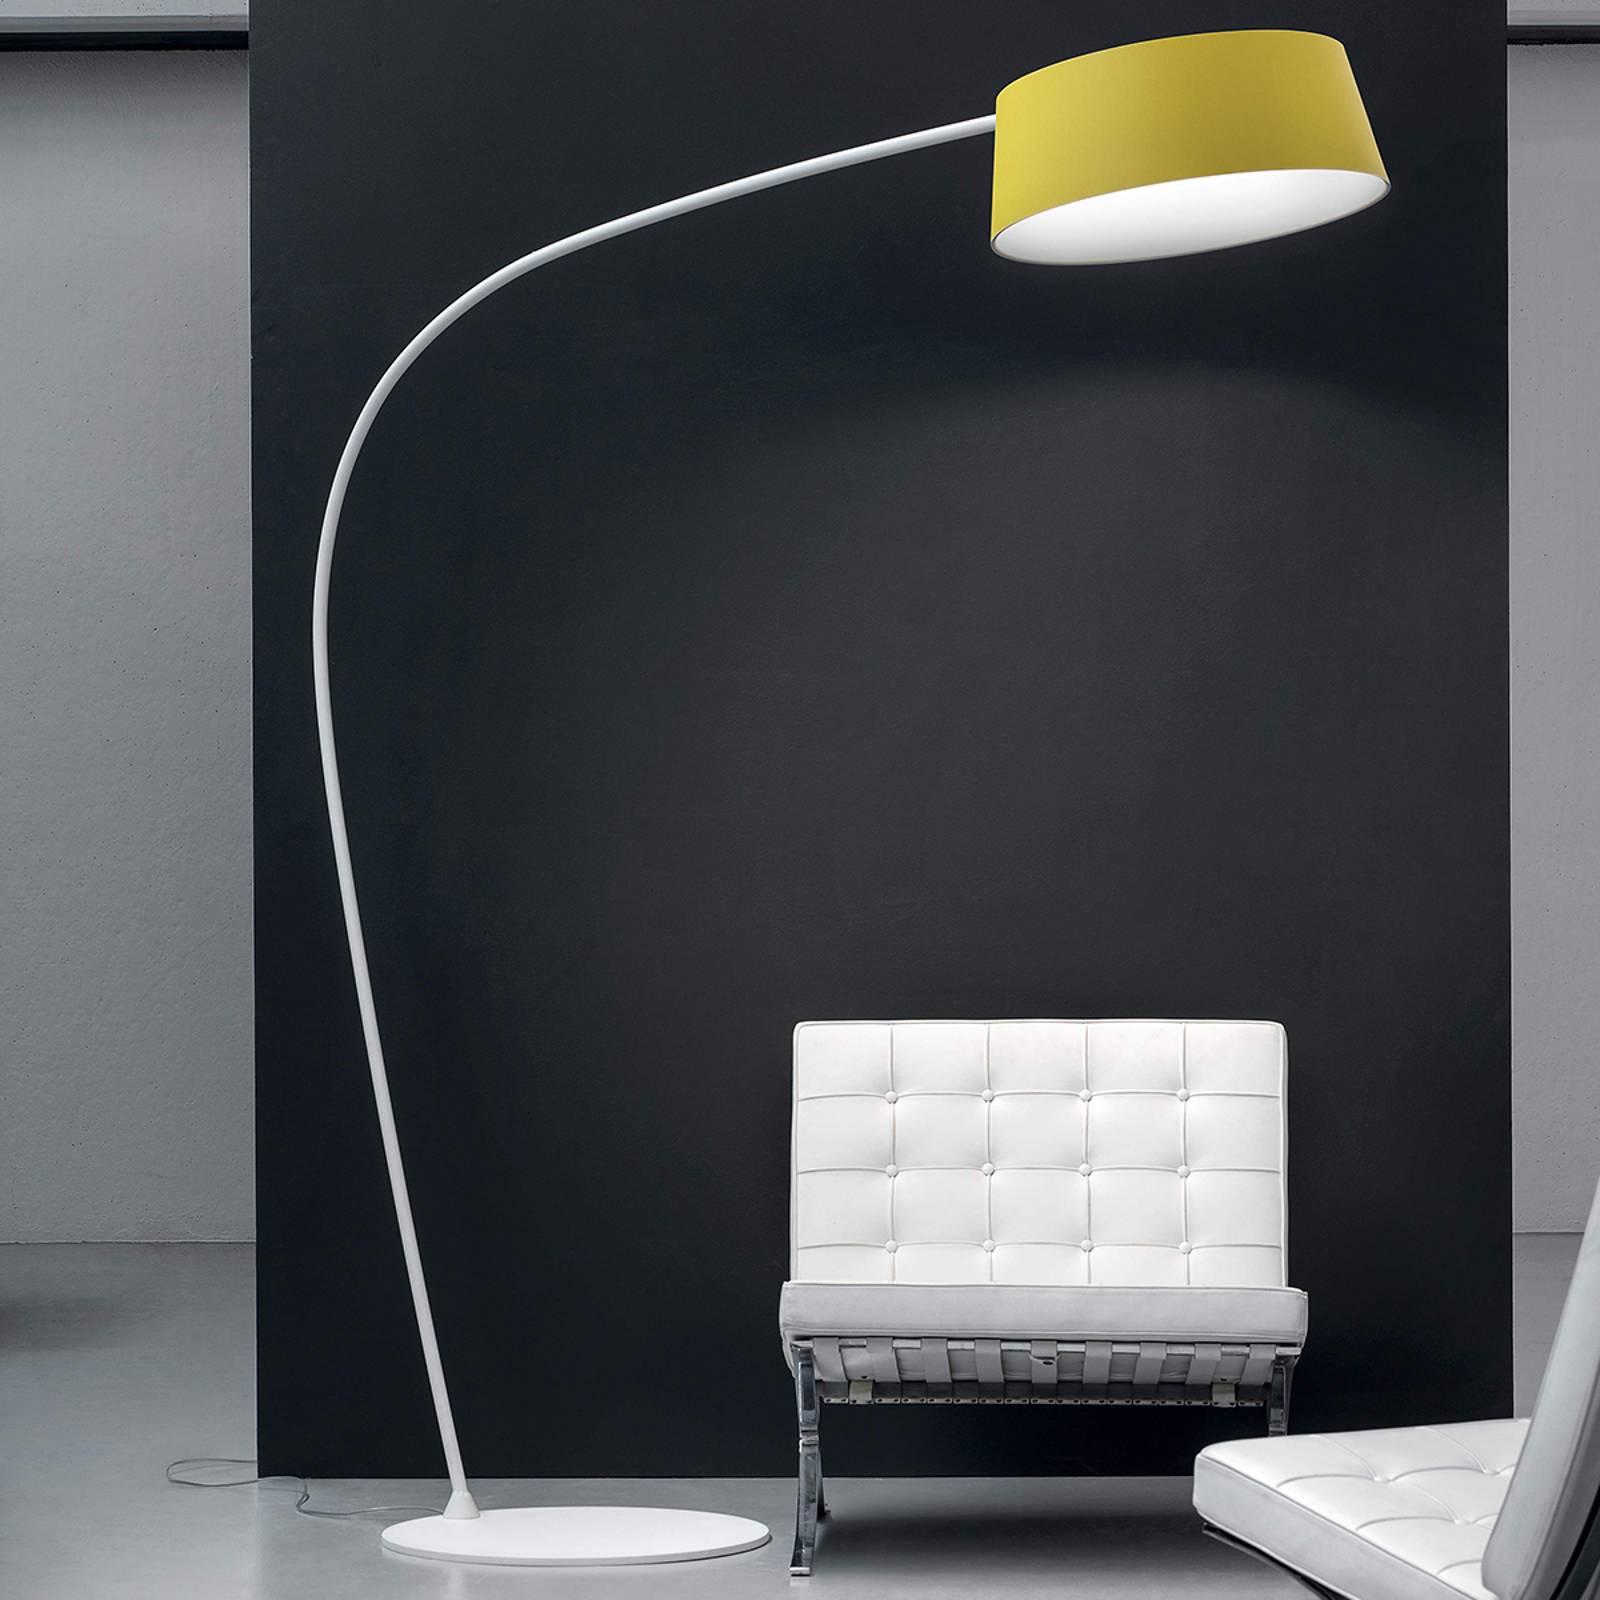 Kleurrijke LED booglamp Oxygen_FL1, instelbaar